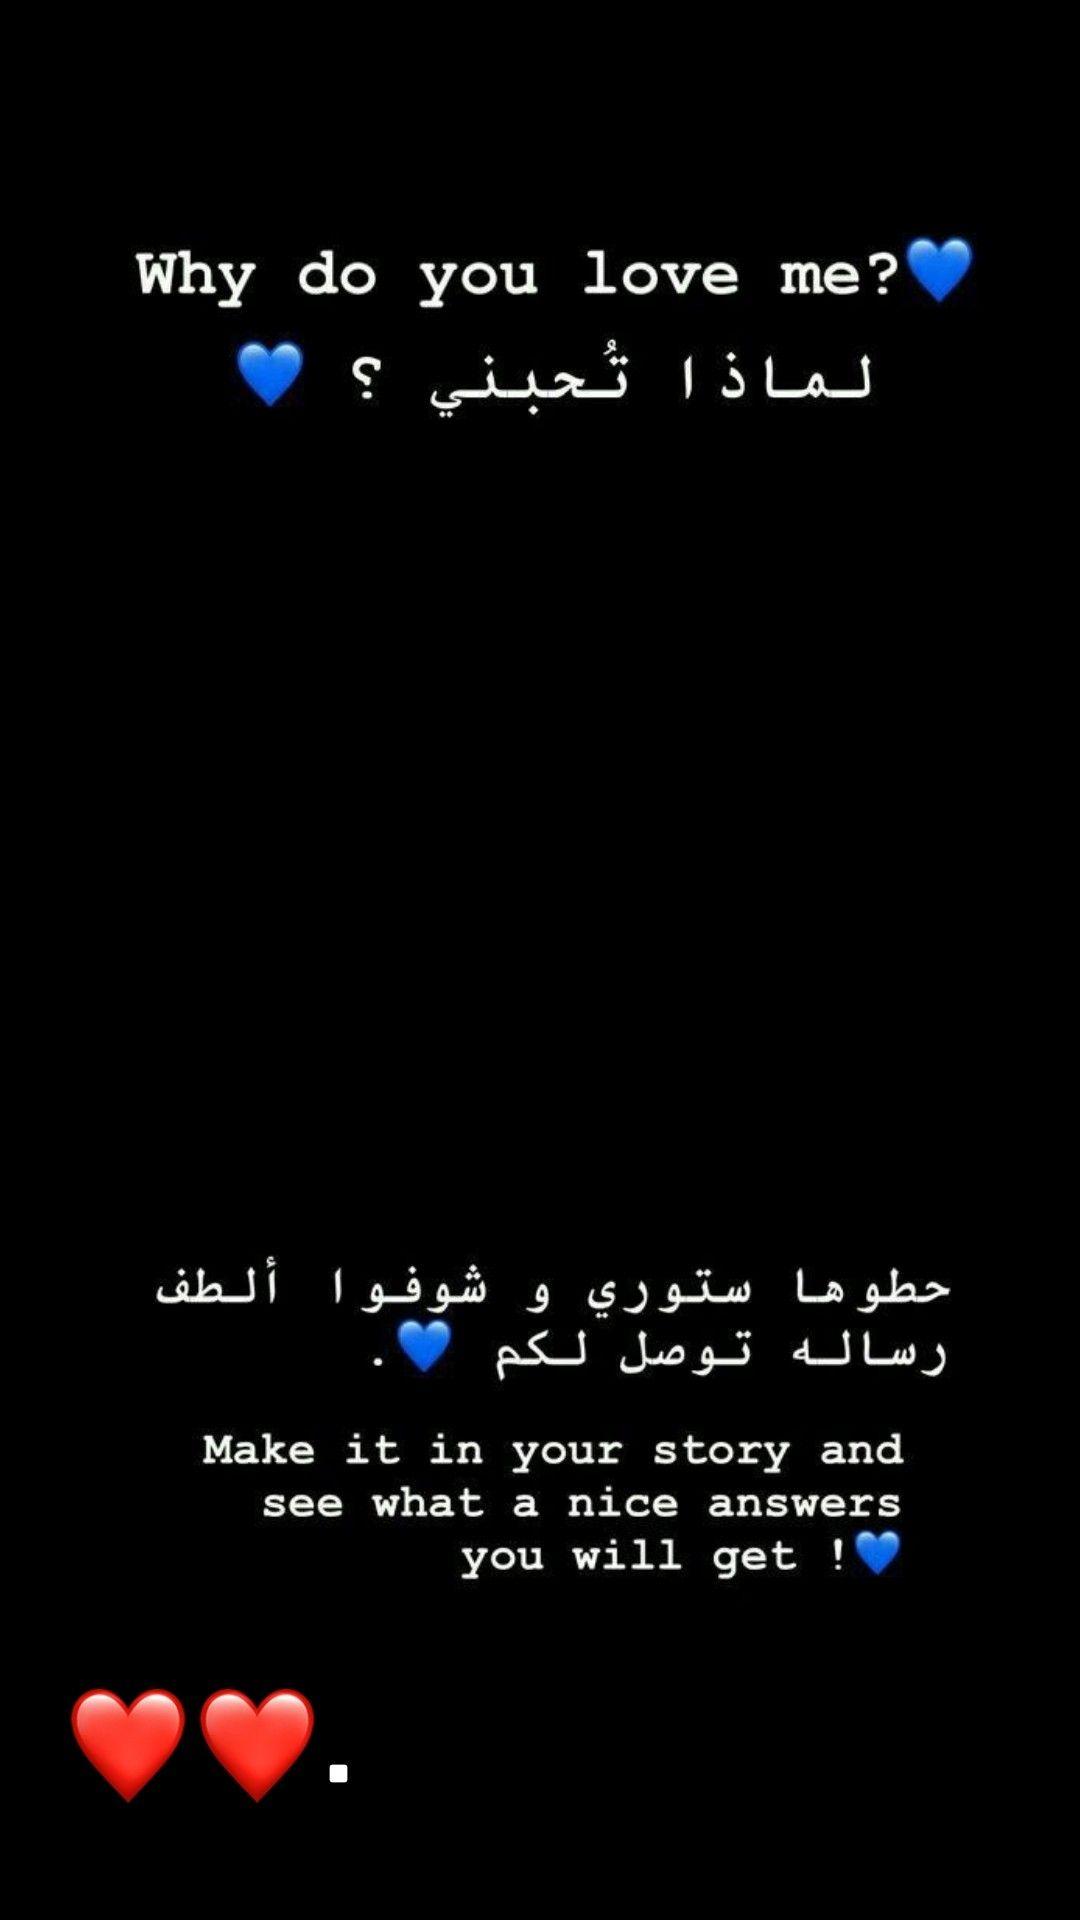 الصحاب الرسائل اللطيفه Words Quotes Wisdom Quotes Funny Arabic Quotes